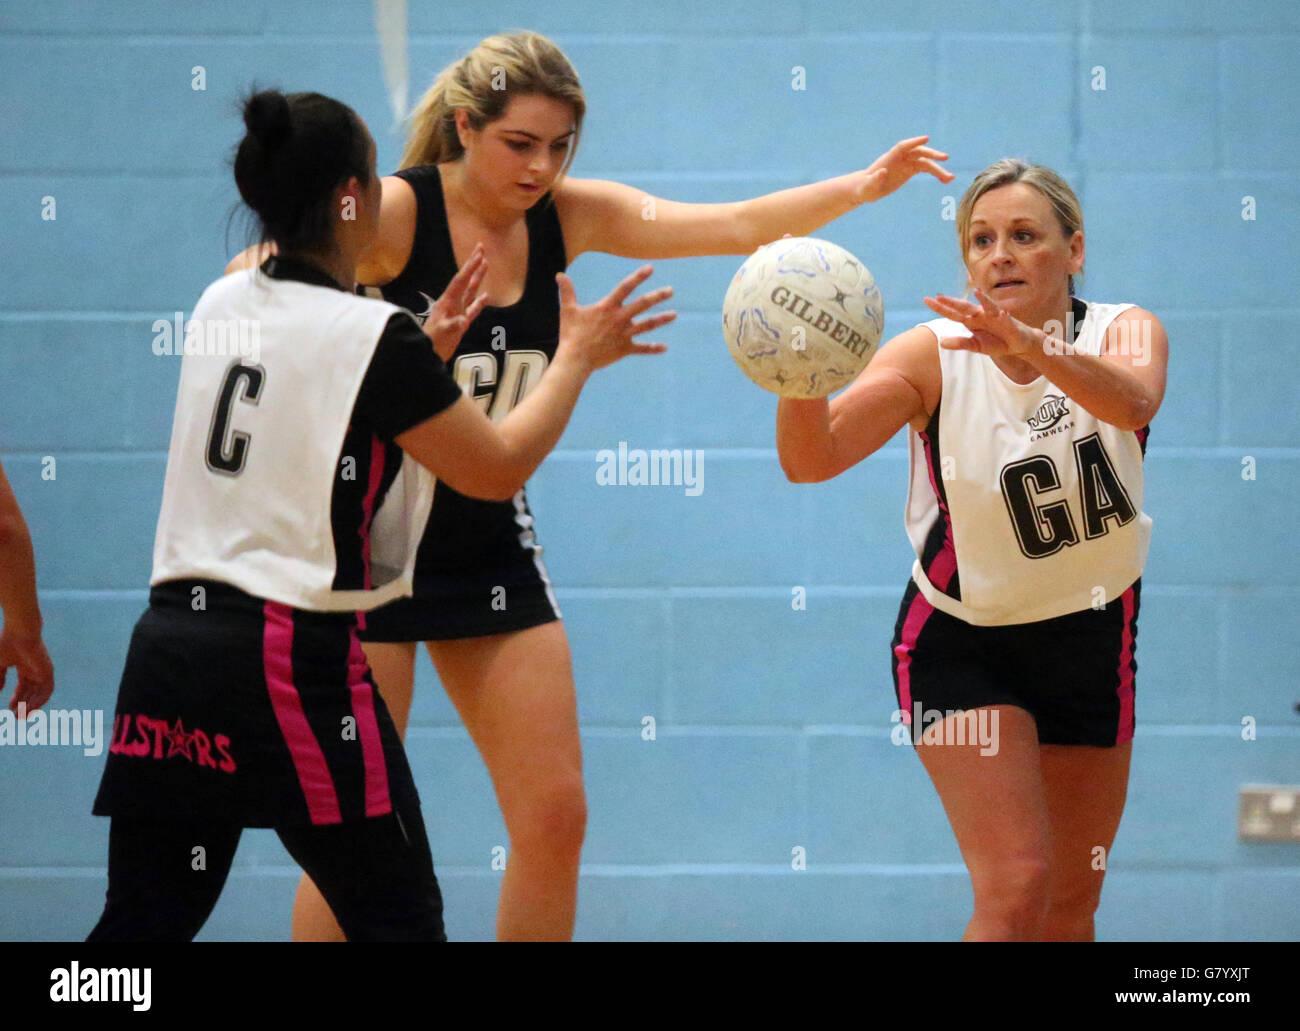 - Retour à l'Angleterre Netball Netball Événement - Mapperley Sports Village - Nottingham Photo Stock